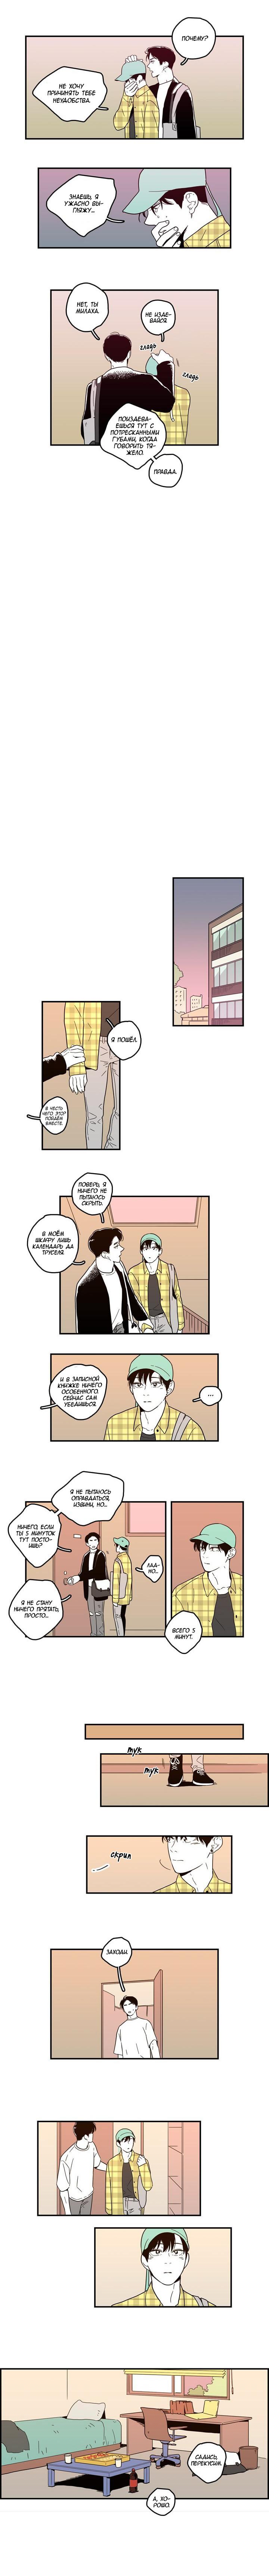 https://r1.ninemanga.com/comics/pic2/25/32217/336565/1509779138348.jpg Page 5